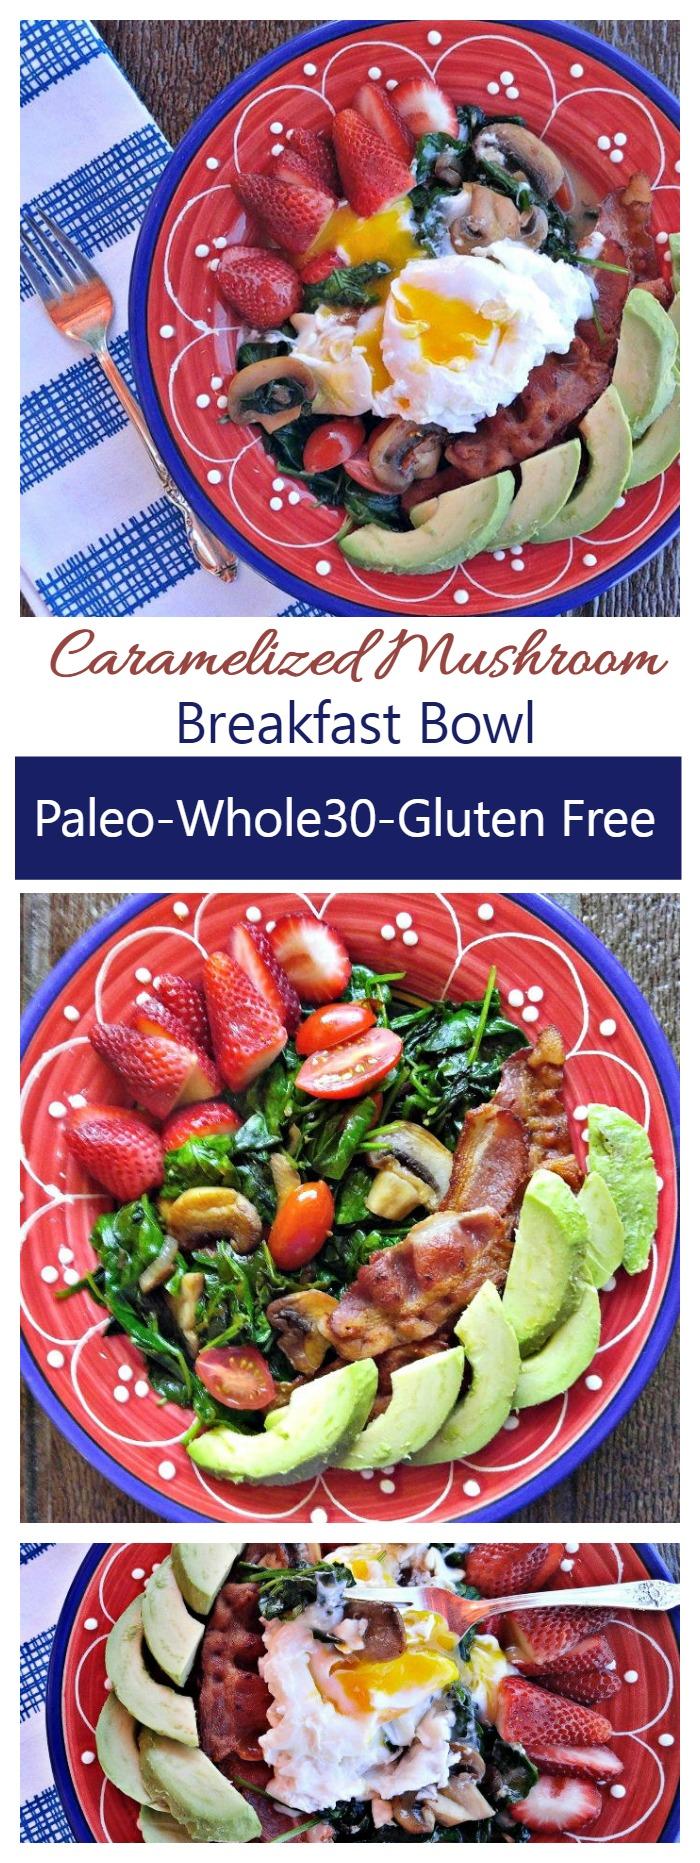 Caramelized Mushroom Breakfast Bowl - Paleo - Whole30 - Gluten Free - Dairy Free